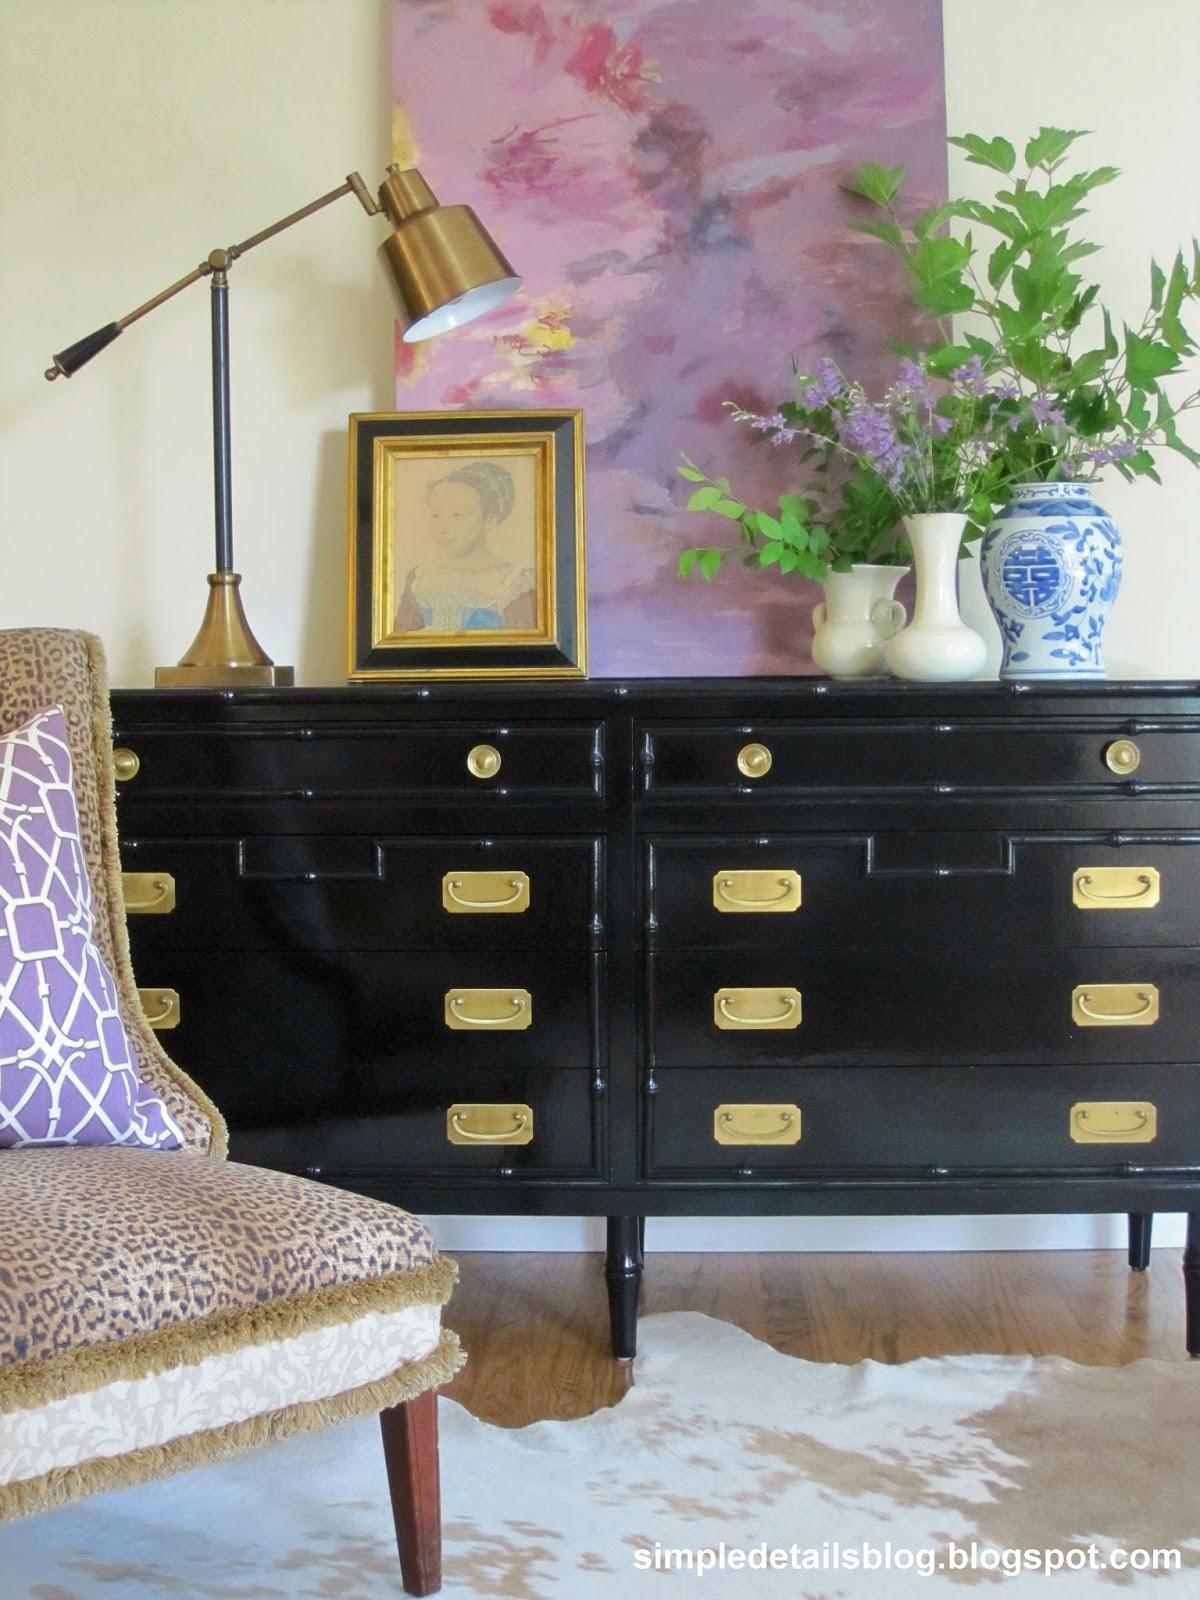 Simple Details Diy Painted Bamboo Dresser